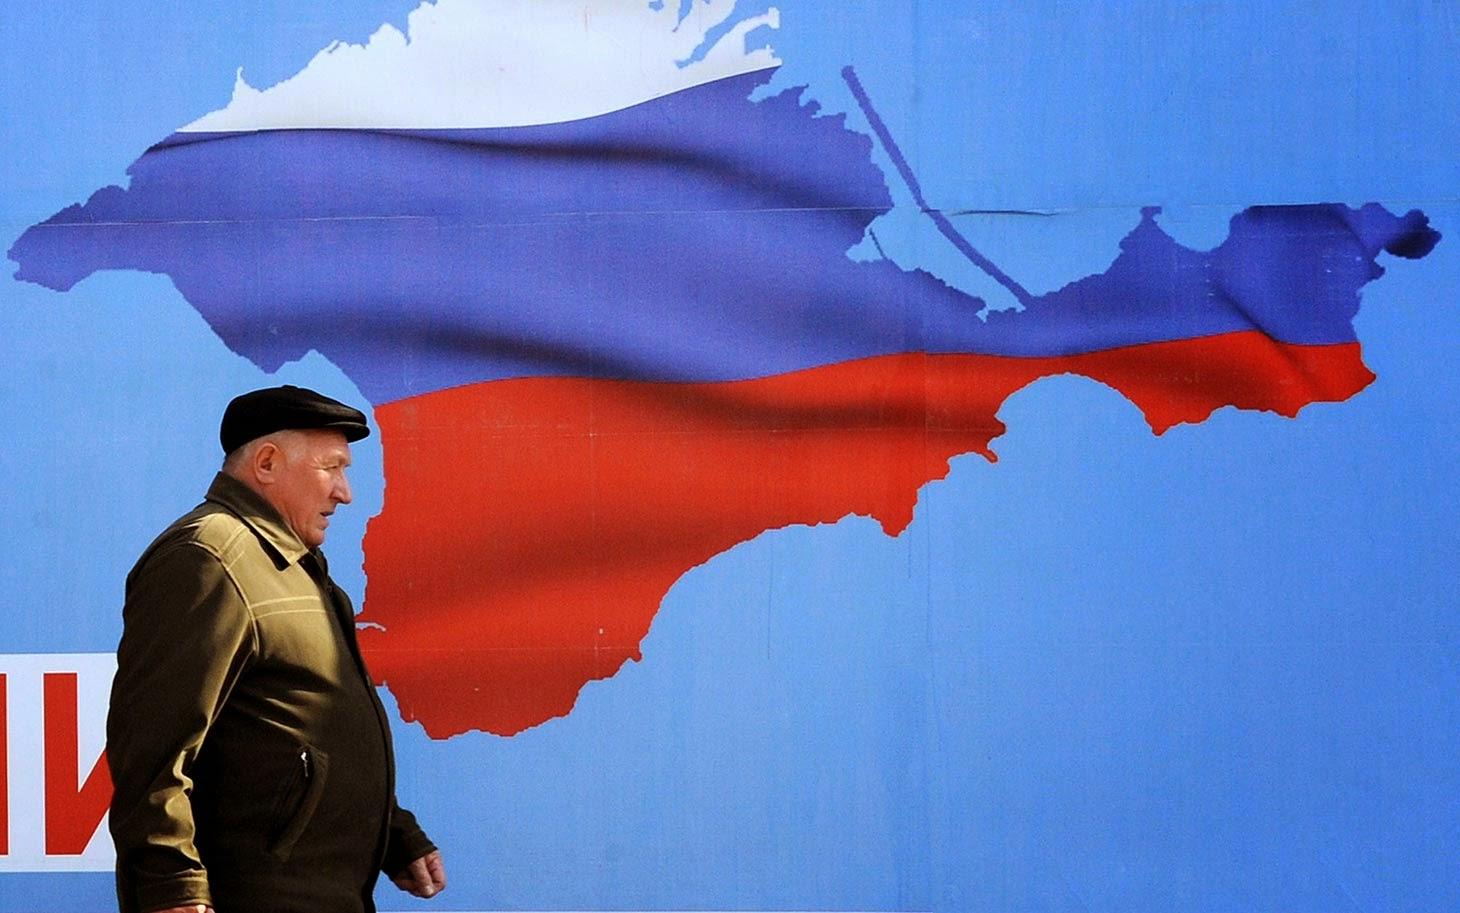 http://crisiglobale.wordpress.com/2014/10/14/focus-ucraina-crimea-elezioni-e-repressioni/